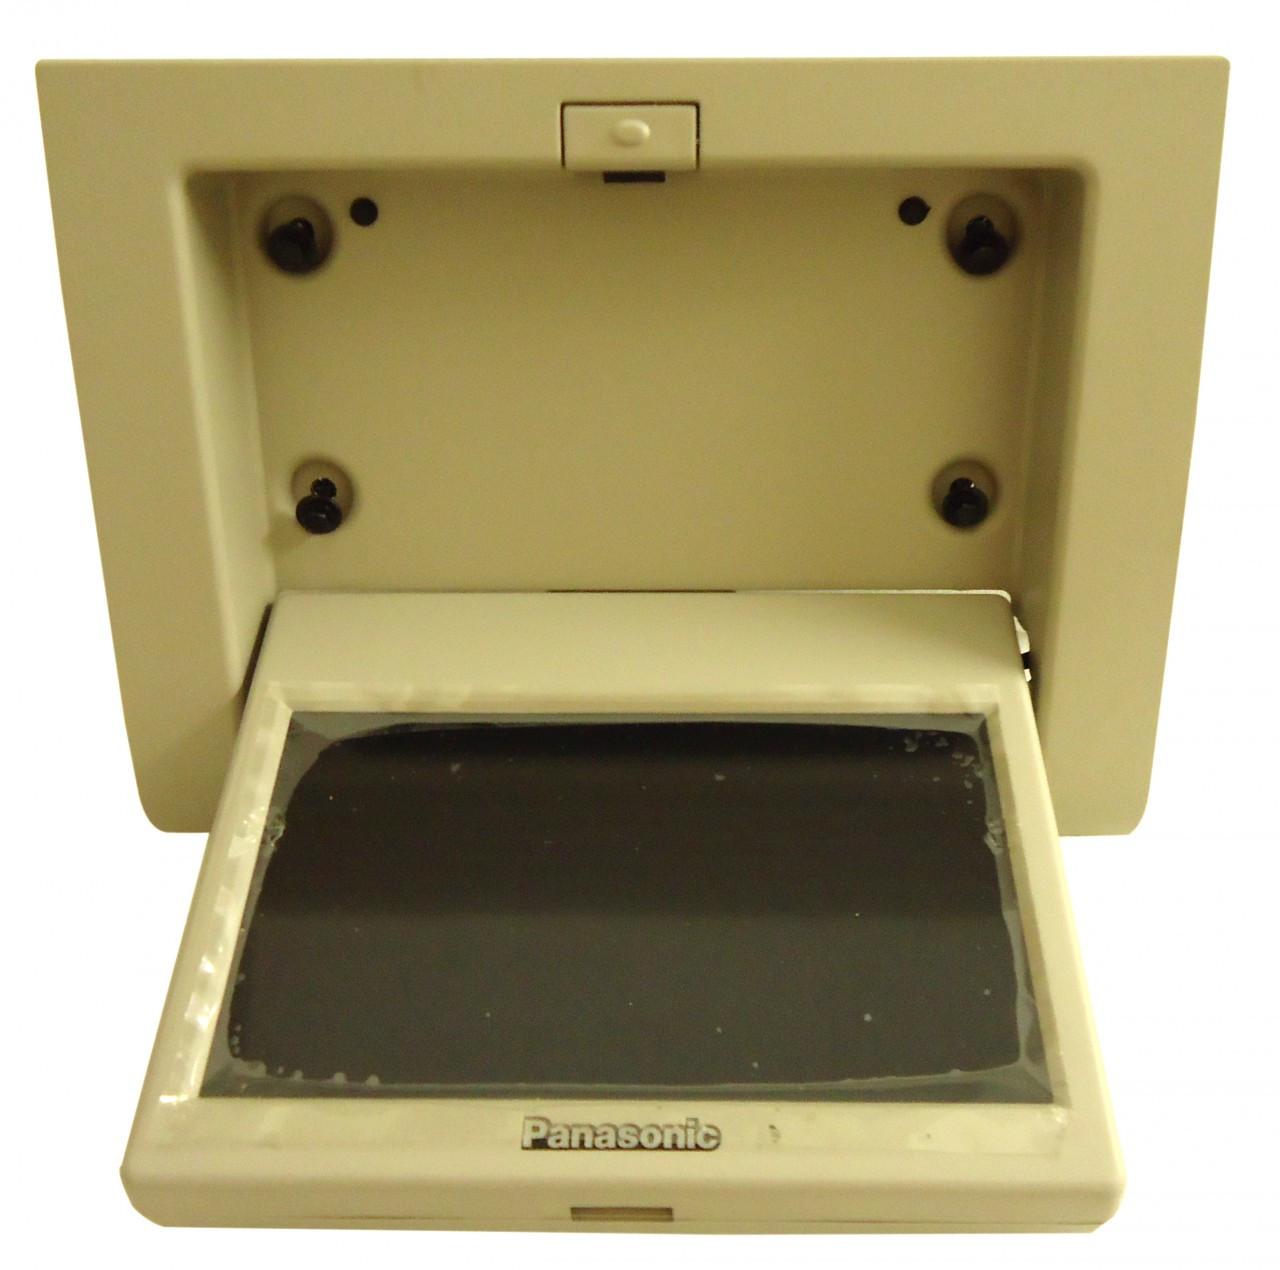 gmc chevy cadillac rear panasonic overhead lcd display screen dvd player monitor ebay